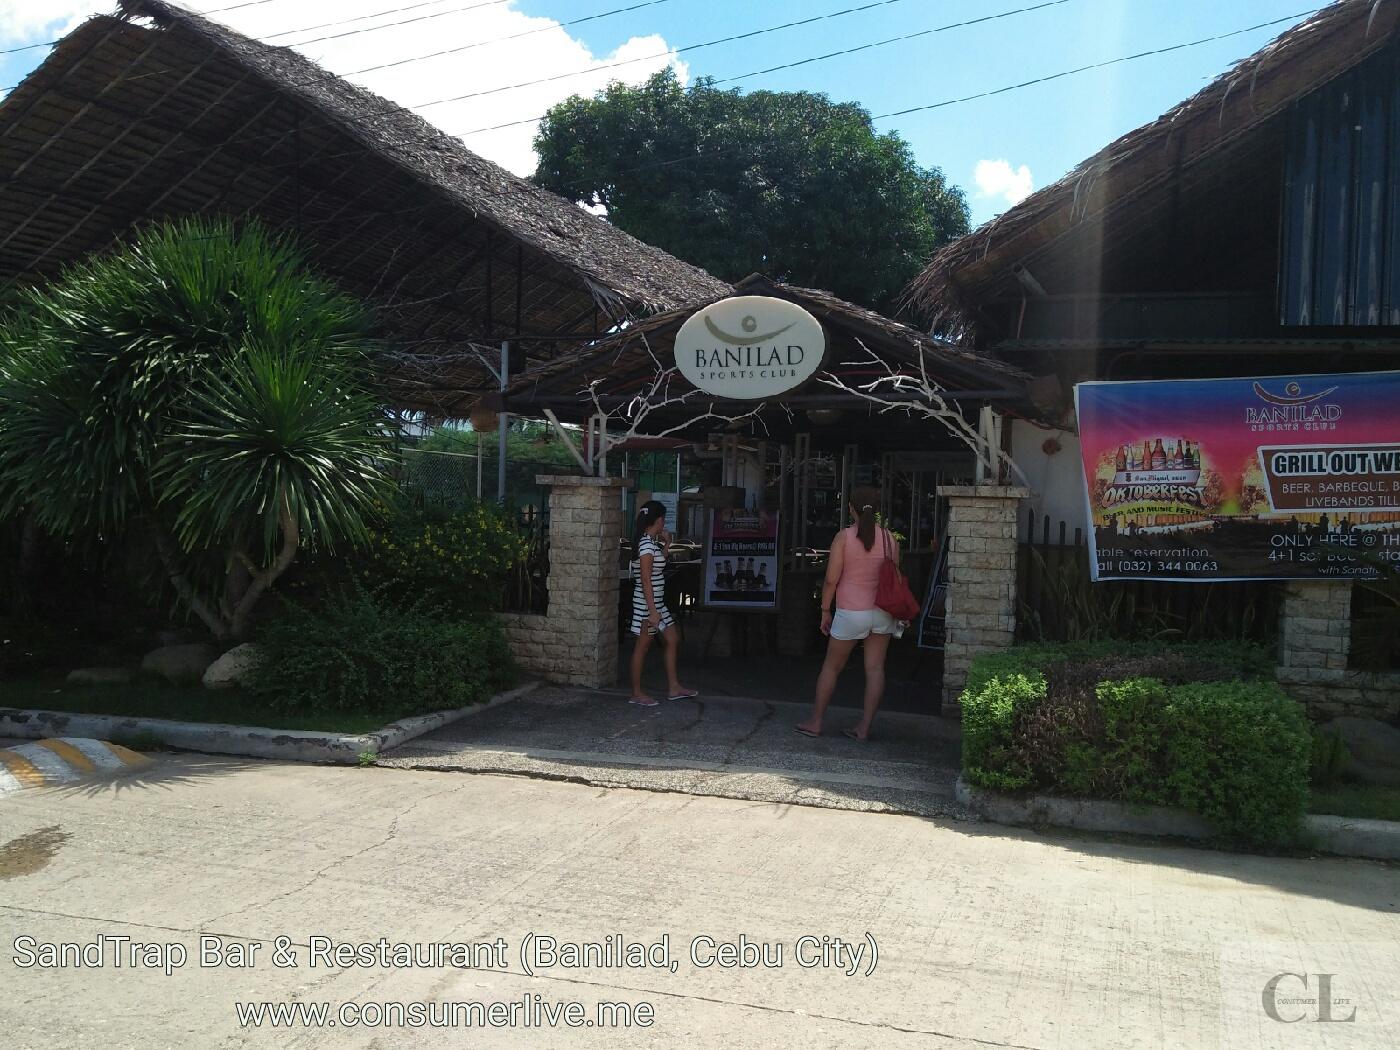 In Pictures: SandTrap Bar and Restaurant (Banilad, Cebu City)